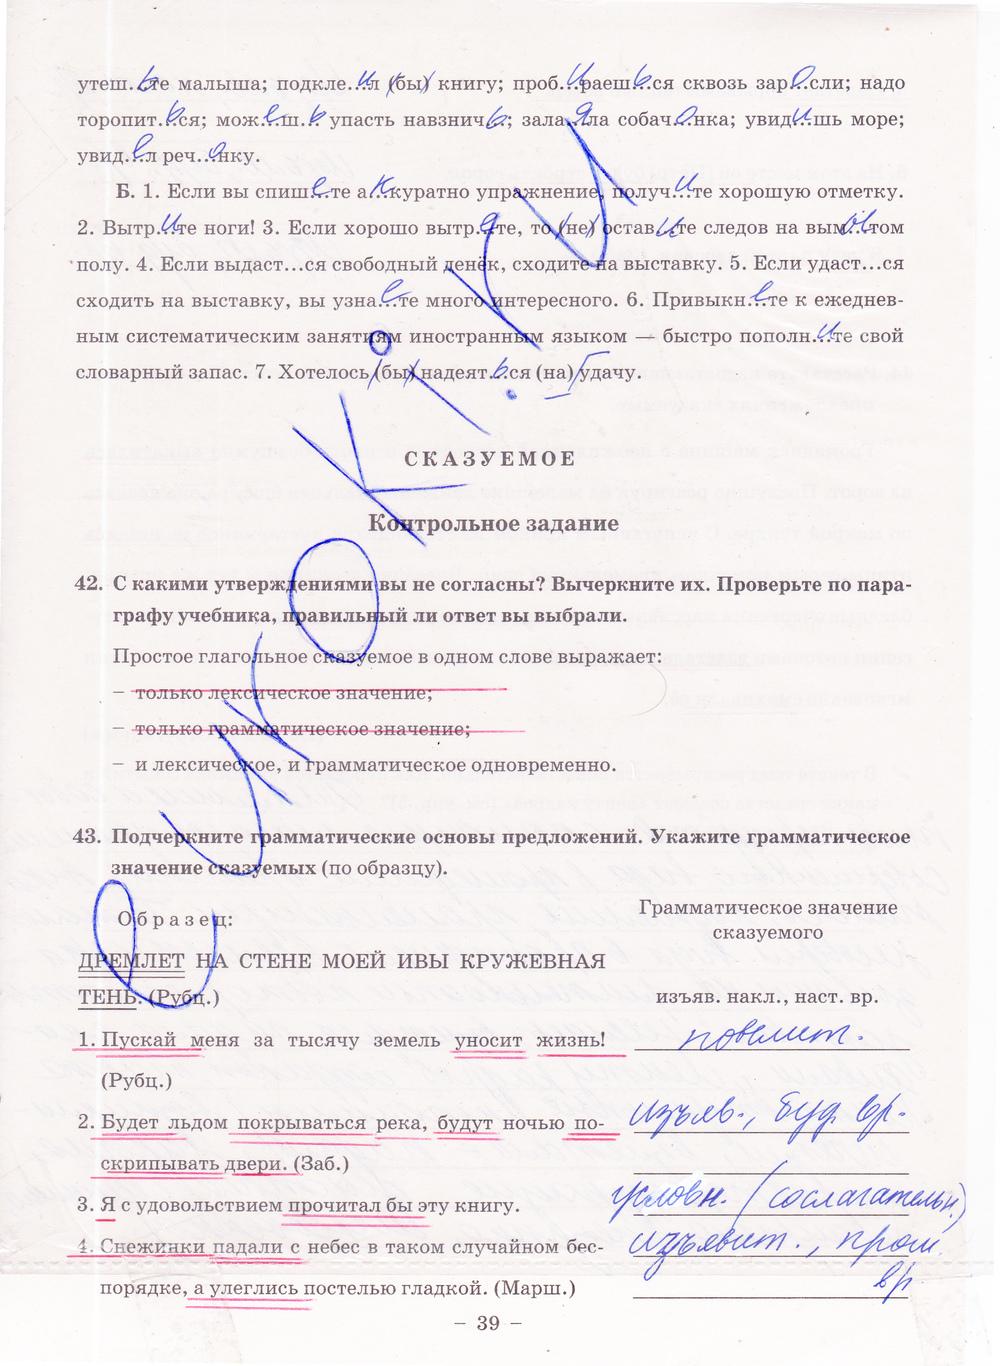 Тетрадь часть 1 гдз языку русскому богданова класс рабочая 8